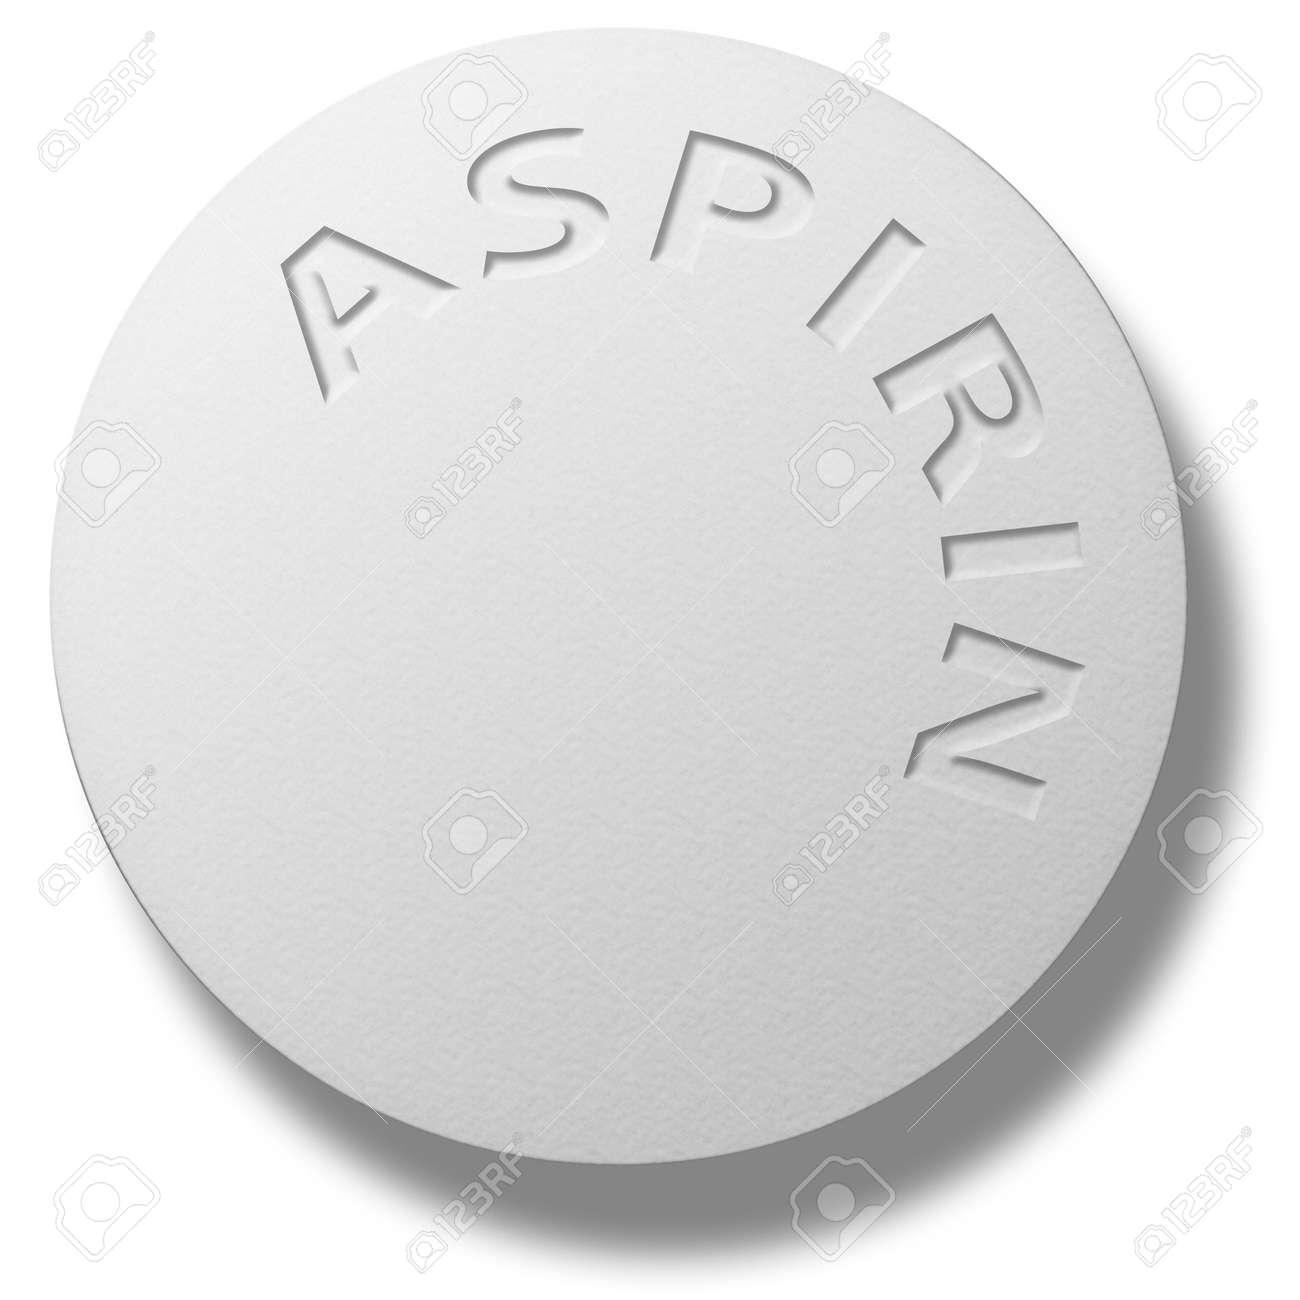 Amount of aspirin in tablet?